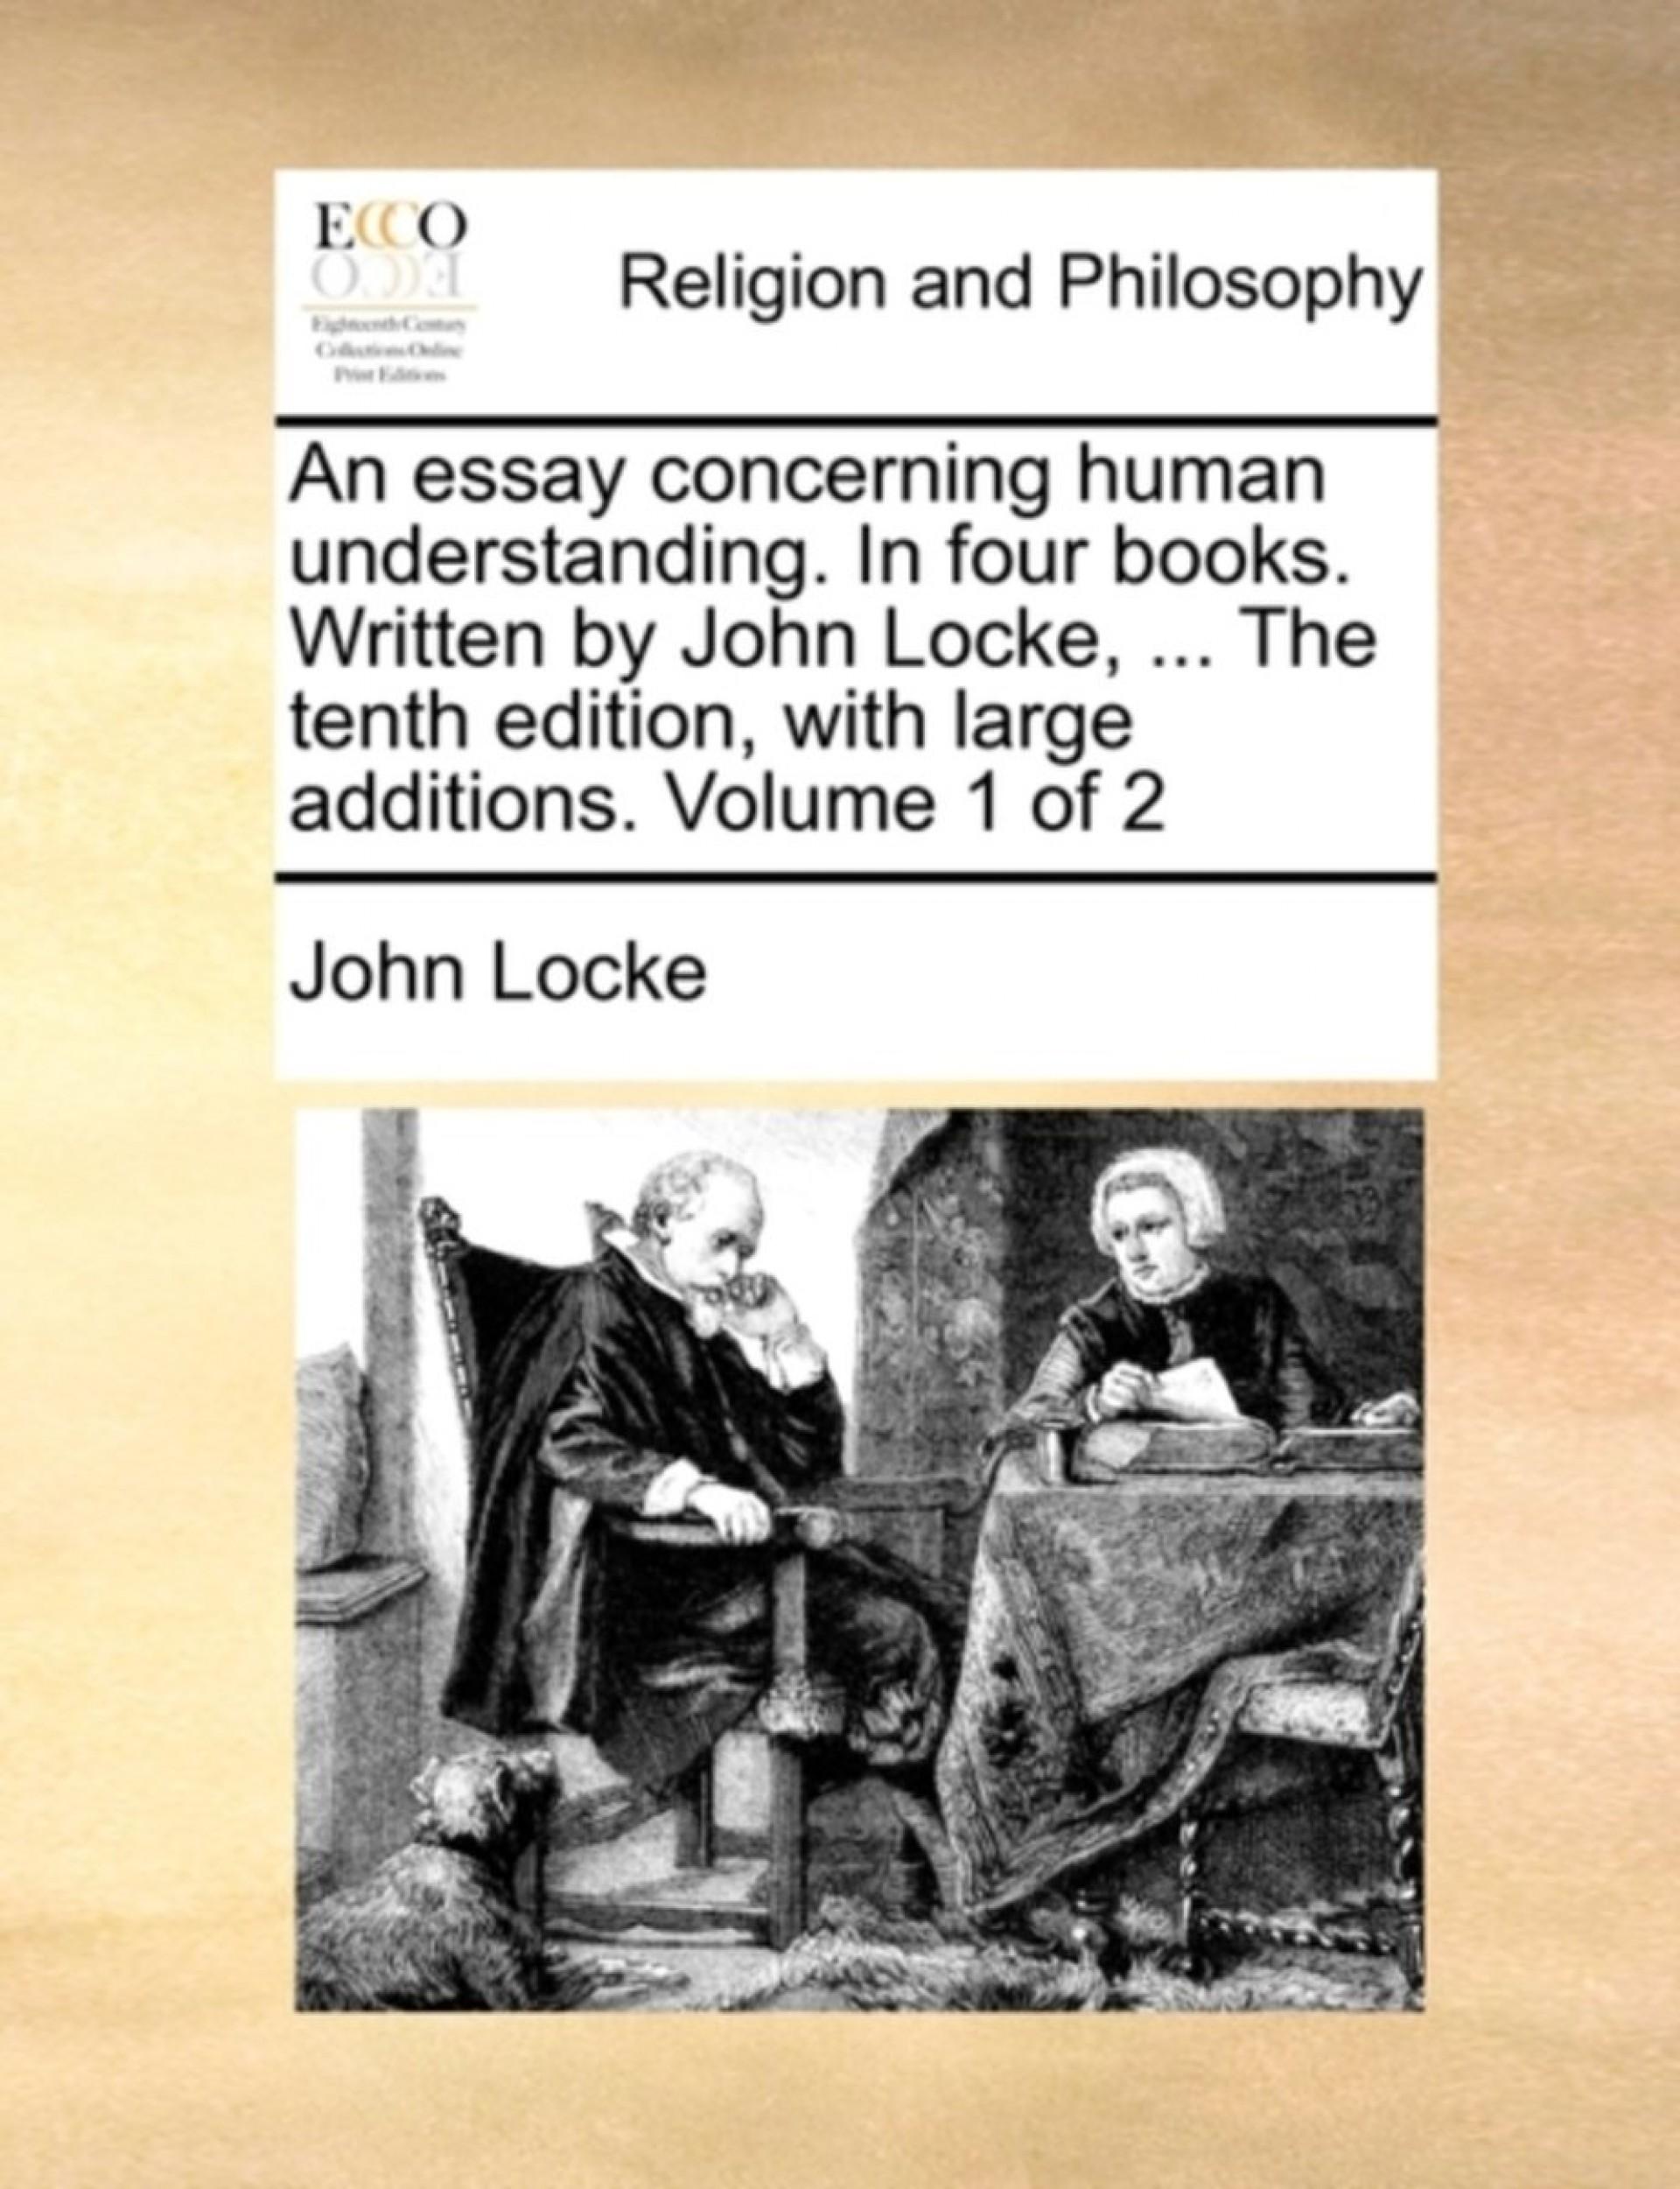 024 Essay Example John Impressive Locke Concerning Human Understanding Book 4 On Pdf Summary 1920